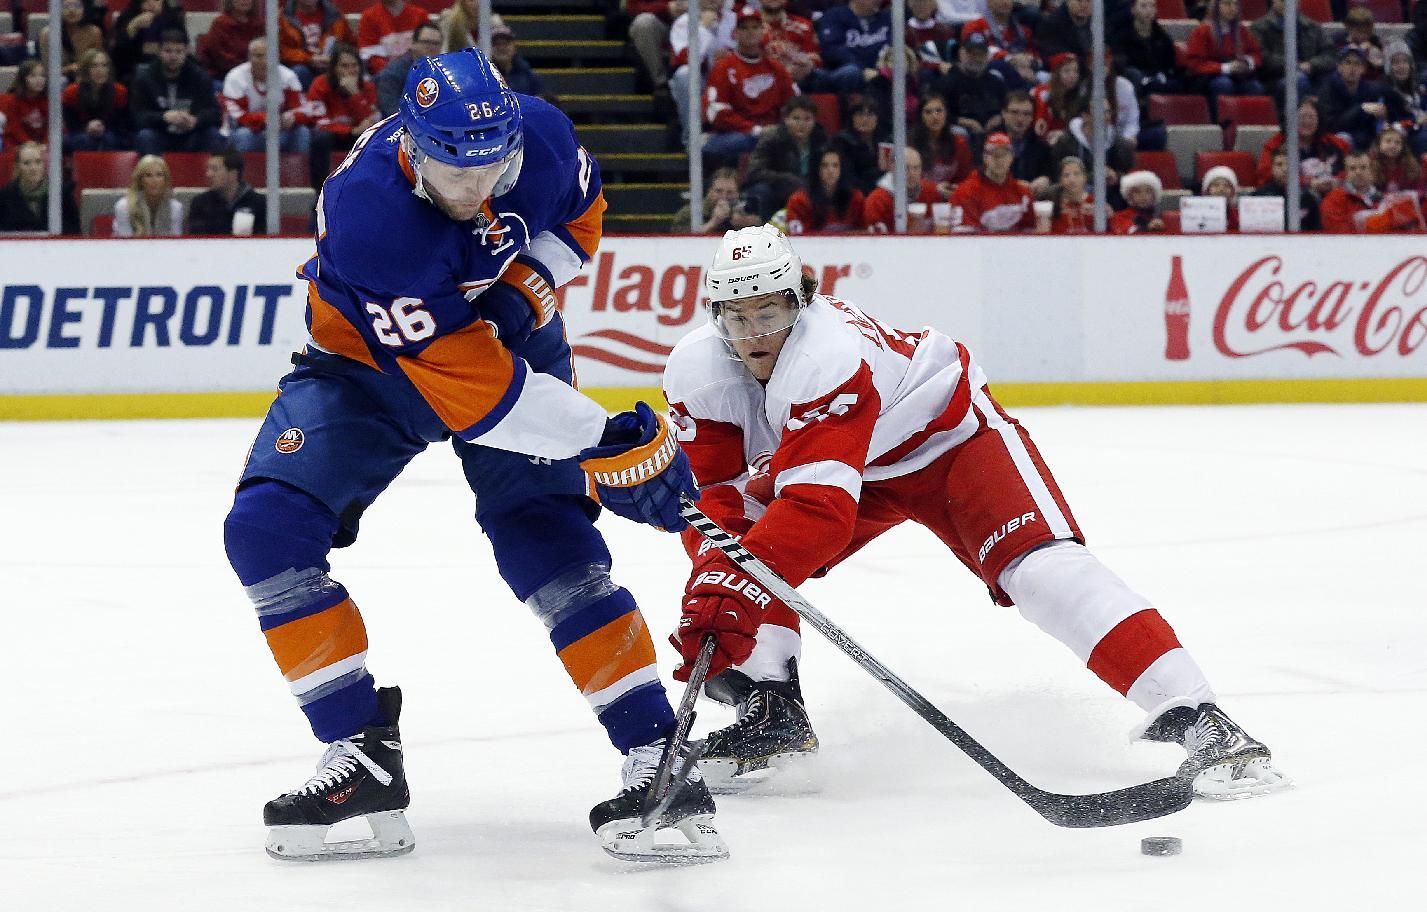 New York Islanders left wing Thomas Vanek (26), of Austria, passes around Detroit Red Wings defenseman Danny DeKeyser (65) in the first period of an NHL hockey game, Monday, Dec. 23, 2013, in Detroit